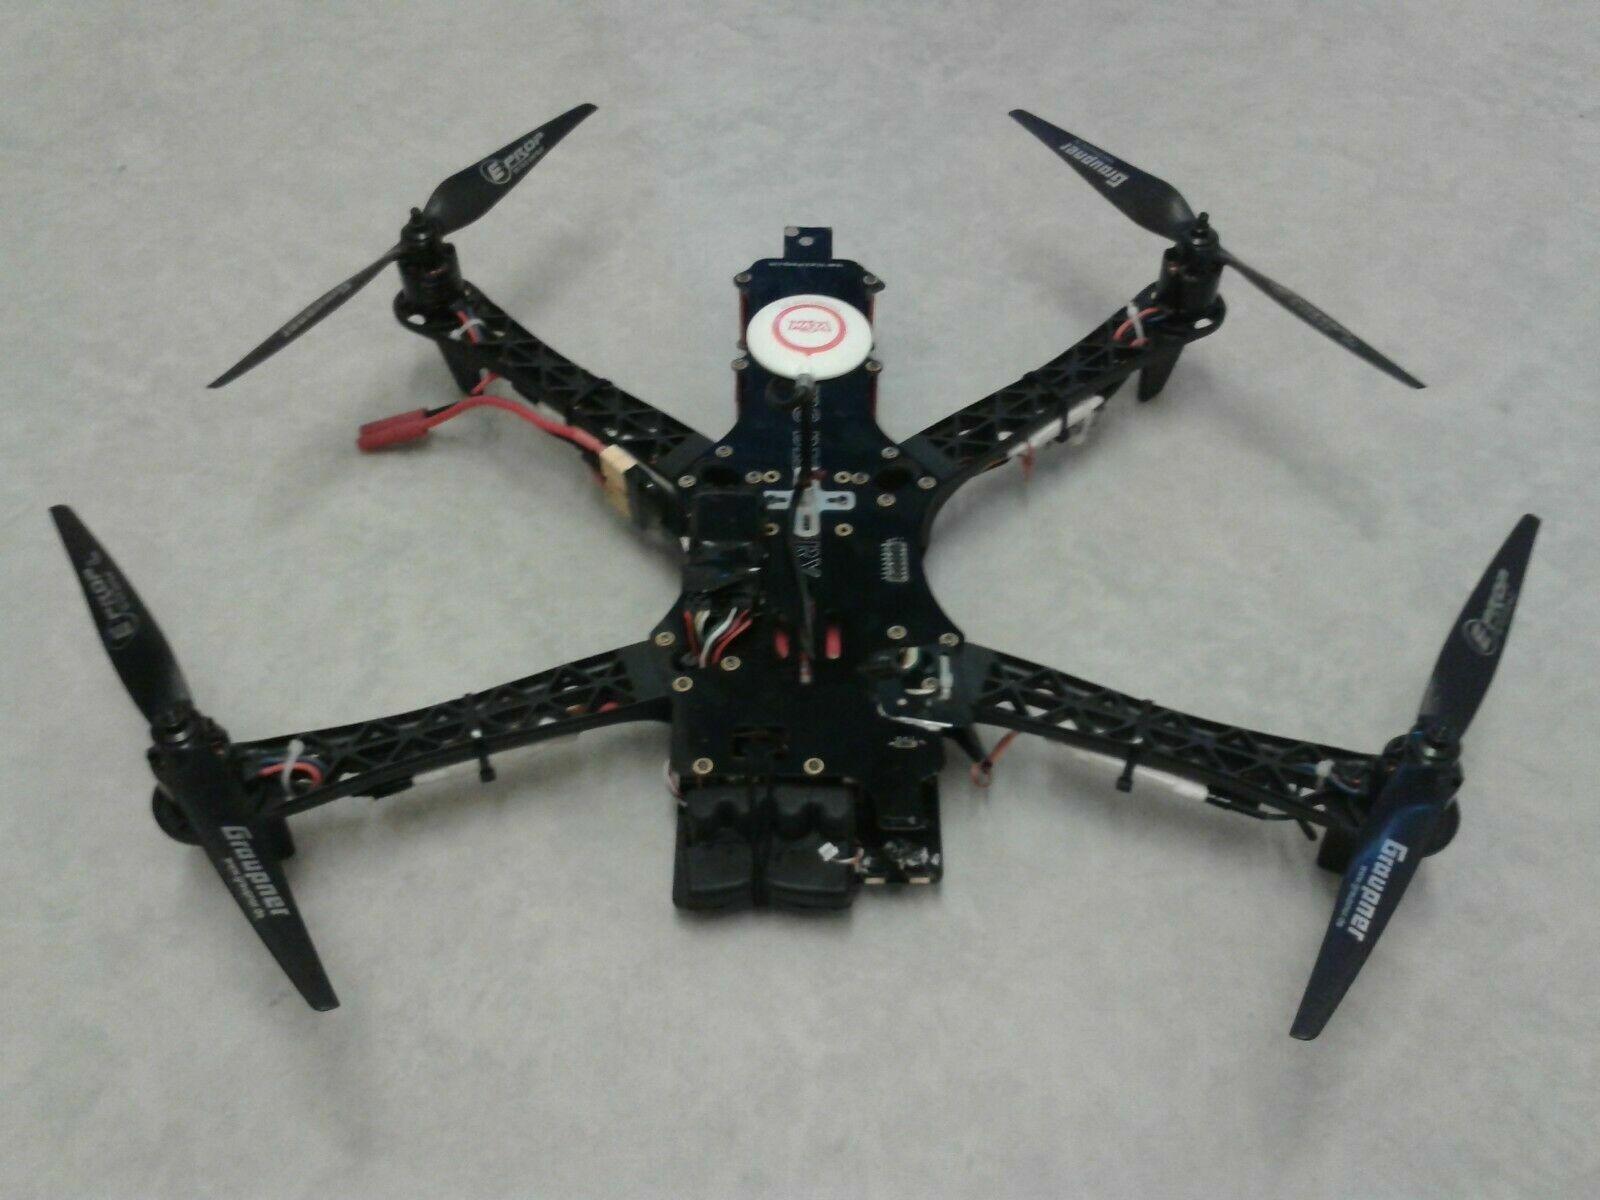 TBS Discovery DJI Naza GPS ImmersionRC EzOSD MOTORI ESC 980KV Quadcopter Drone